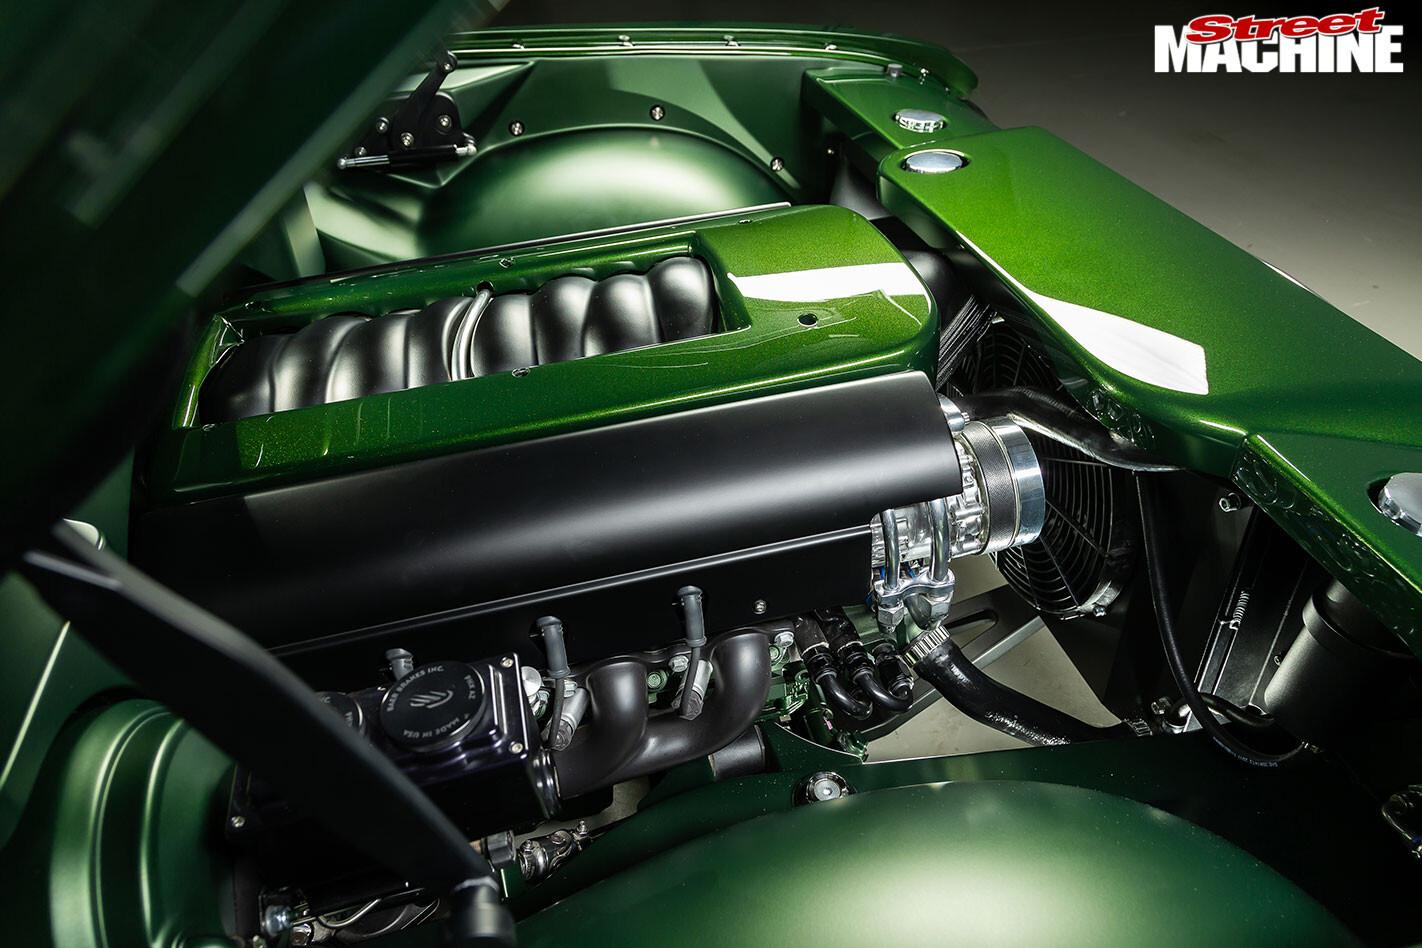 Holden HT Monaro engine bay